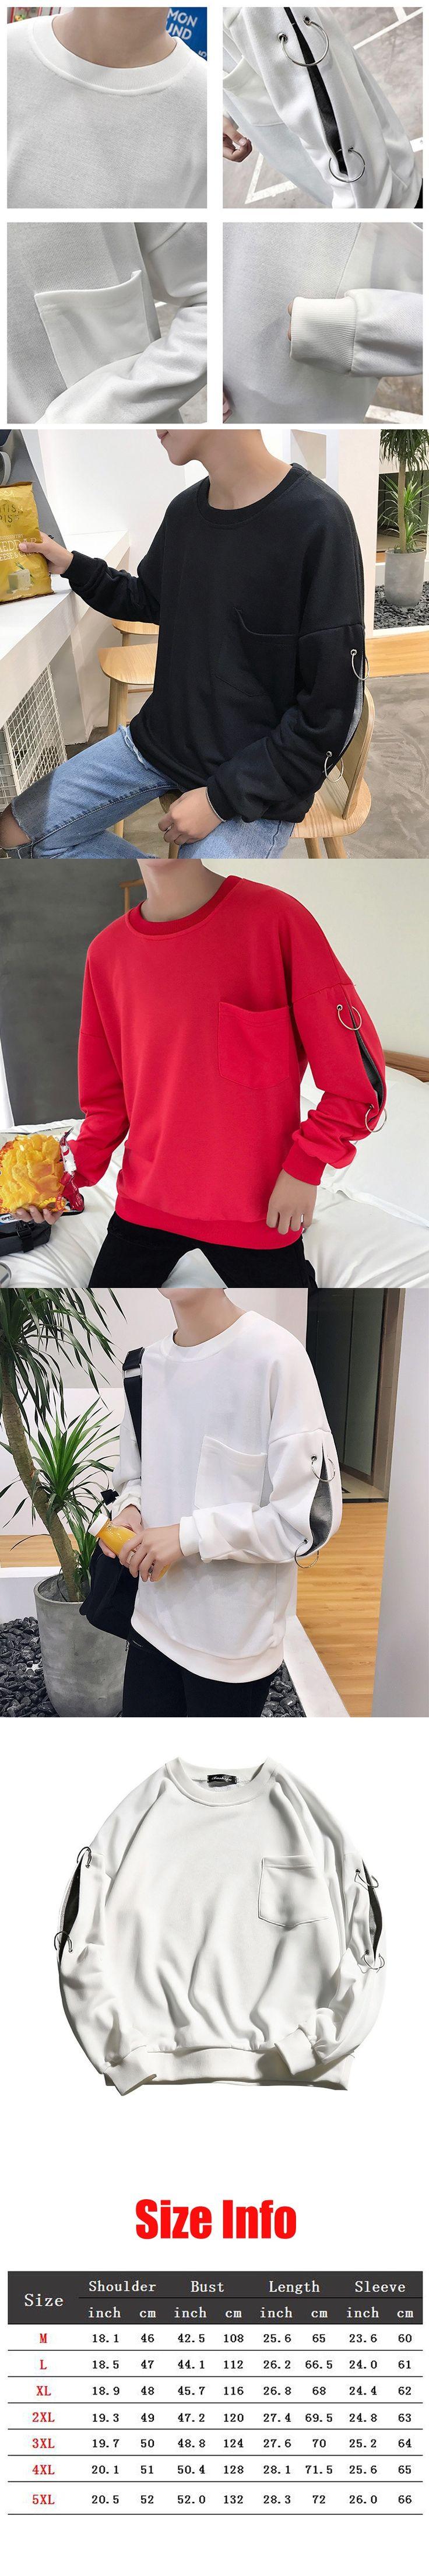 TELUNDANNI 2017 Red O-neck Casual Hoodies Men Hip Hop Clothing Fashion Pocket Sweatshirts Skateboard Pullover